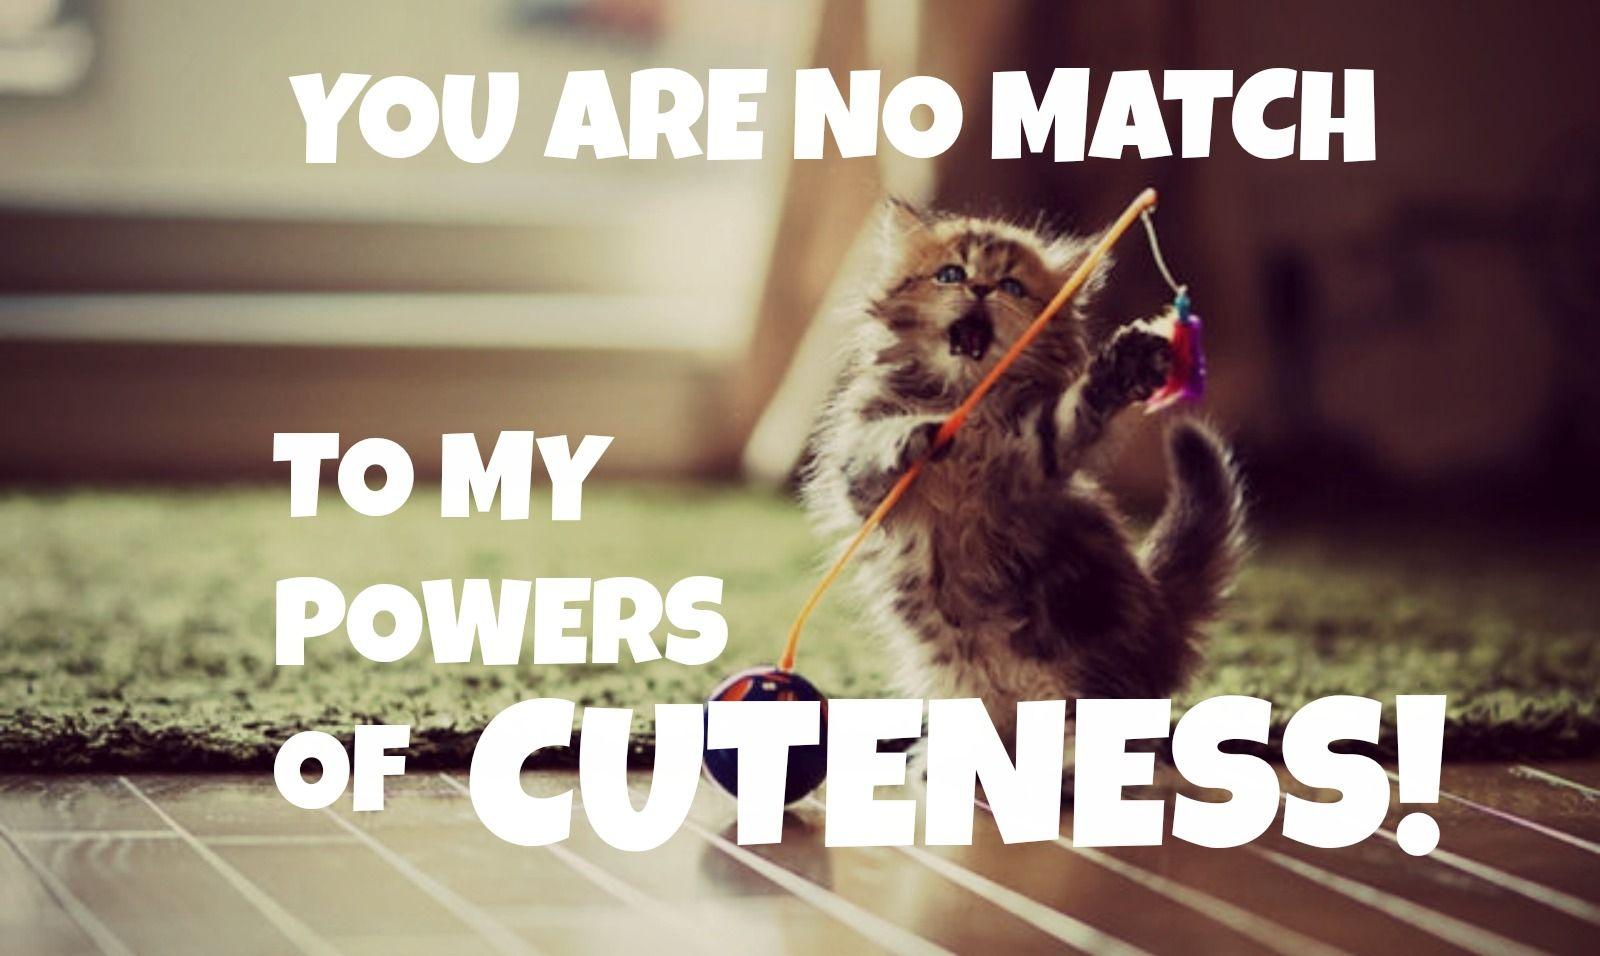 Pin by Savannah Bason on cute animals Cute animal quotes